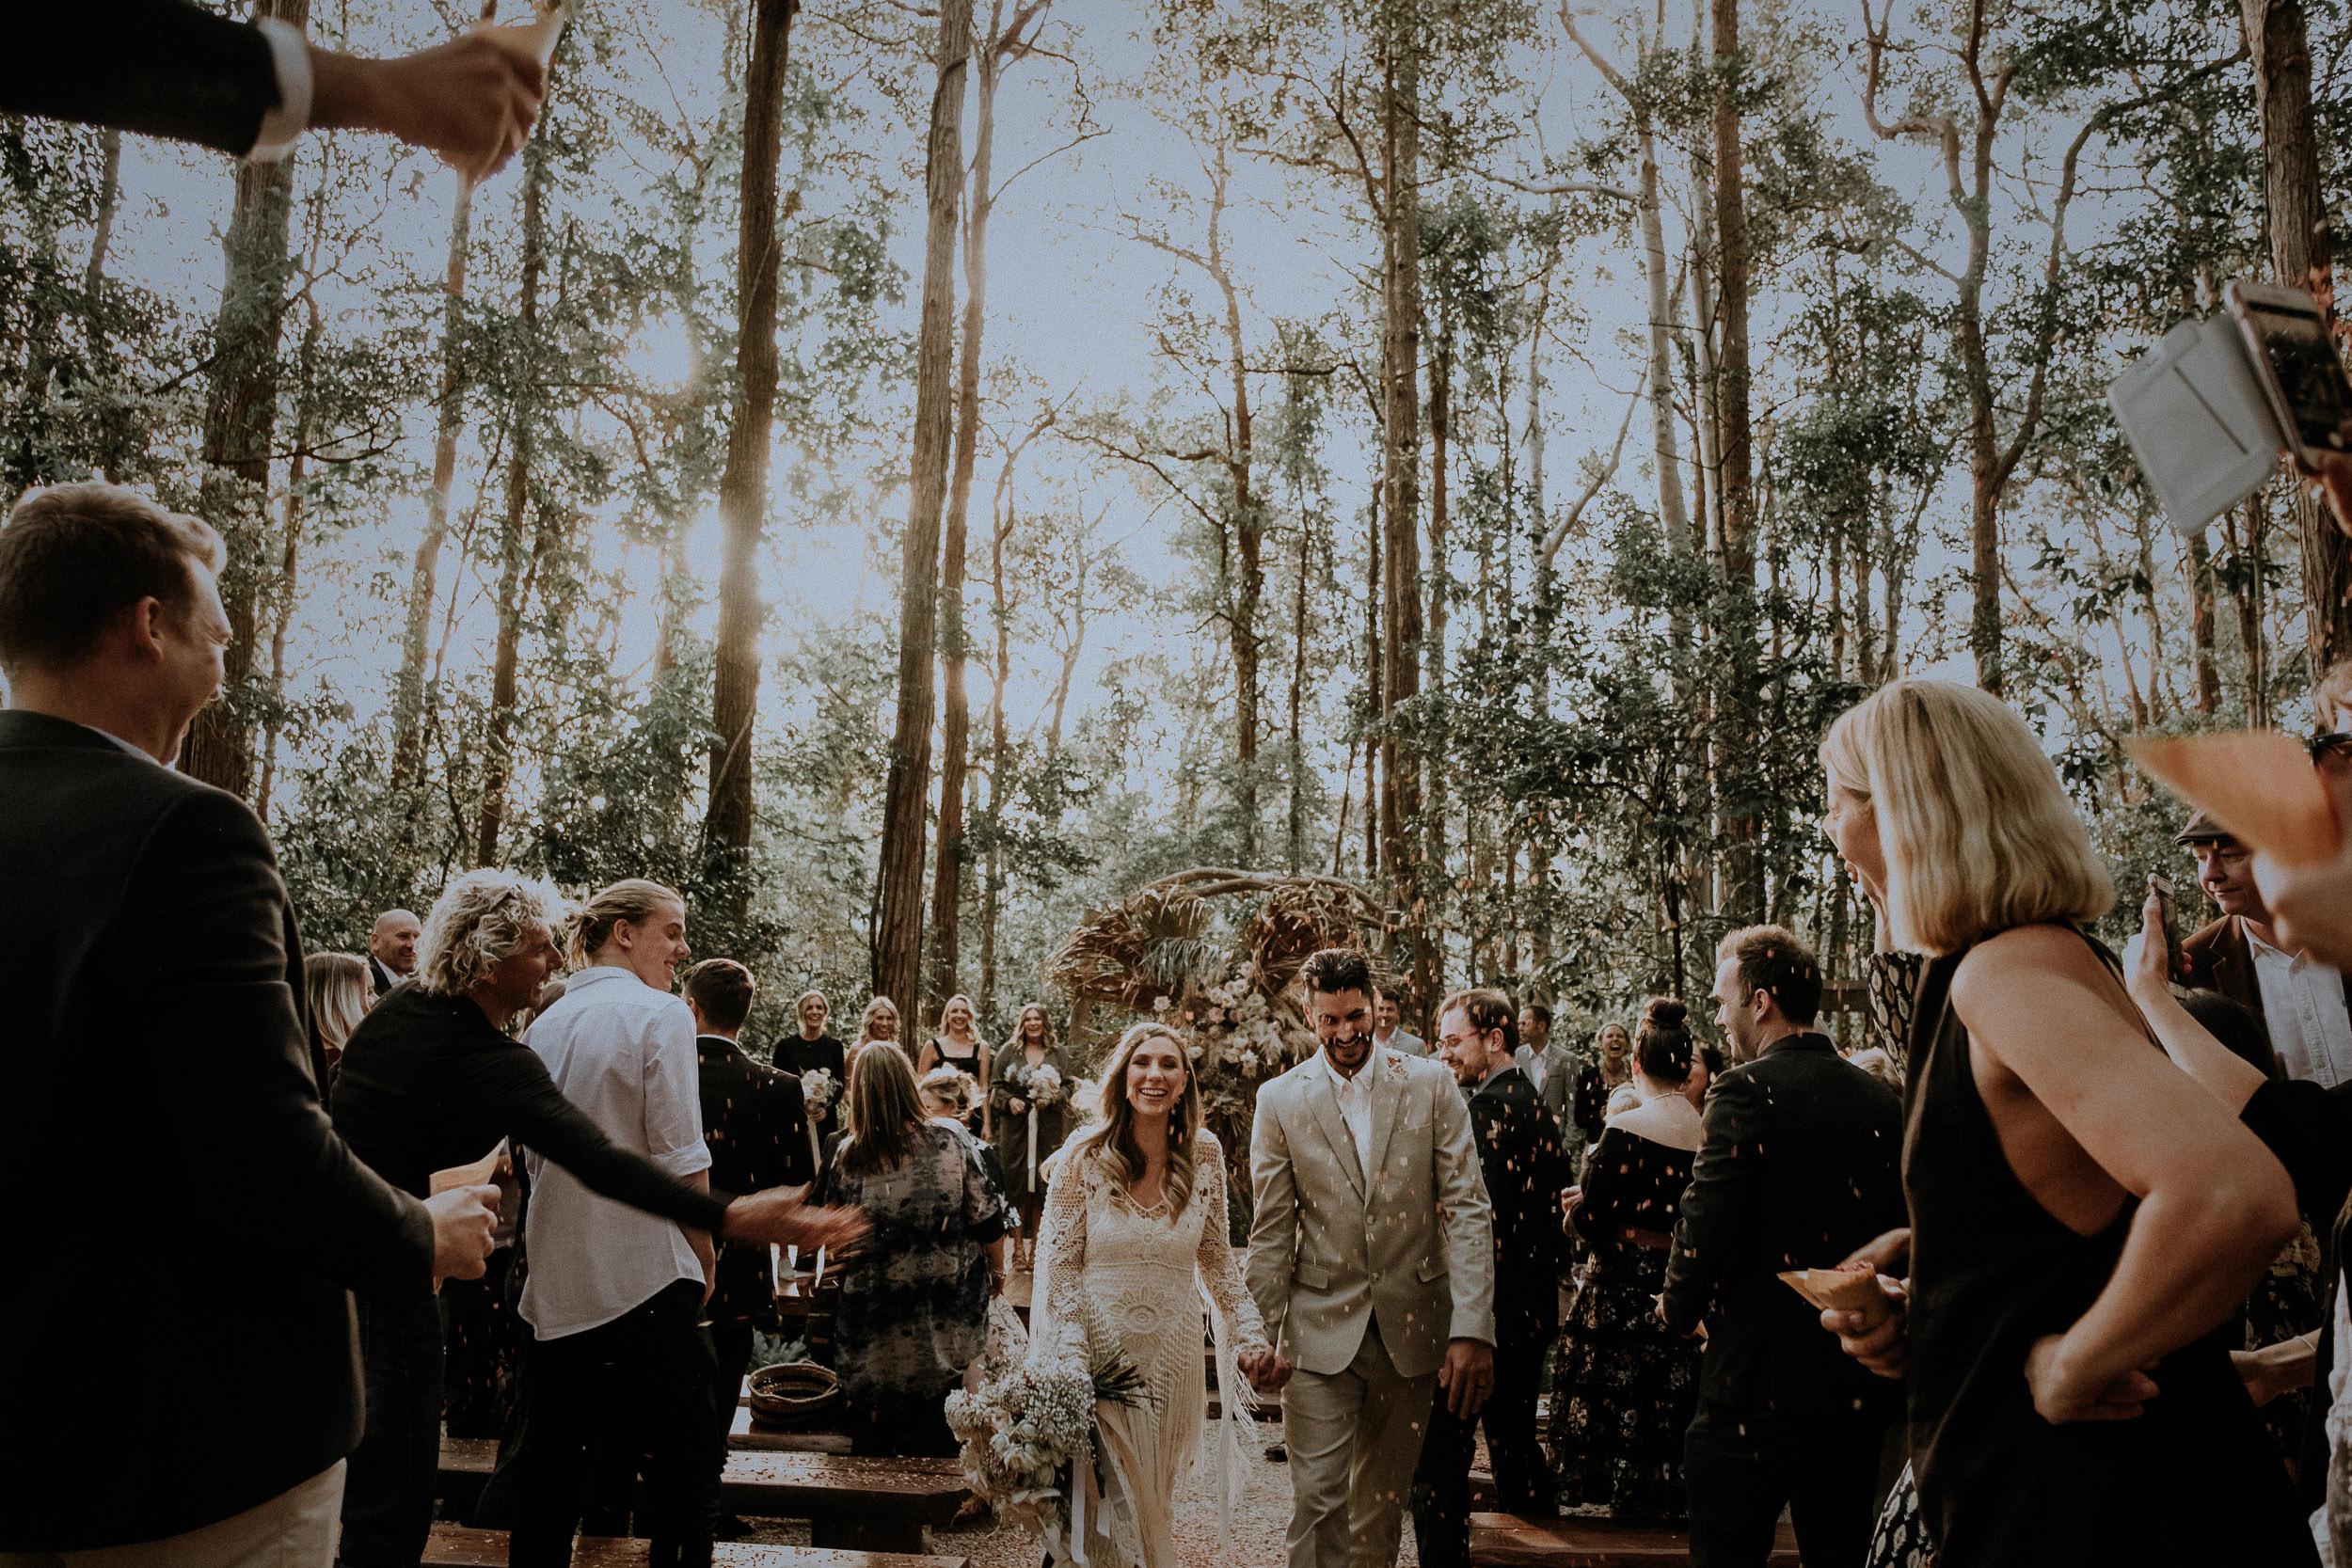 S&A Elopement - Kings & Thieves - Shred 'Til Dead - Central Coast Beach Forest Wedding - 287.jpg